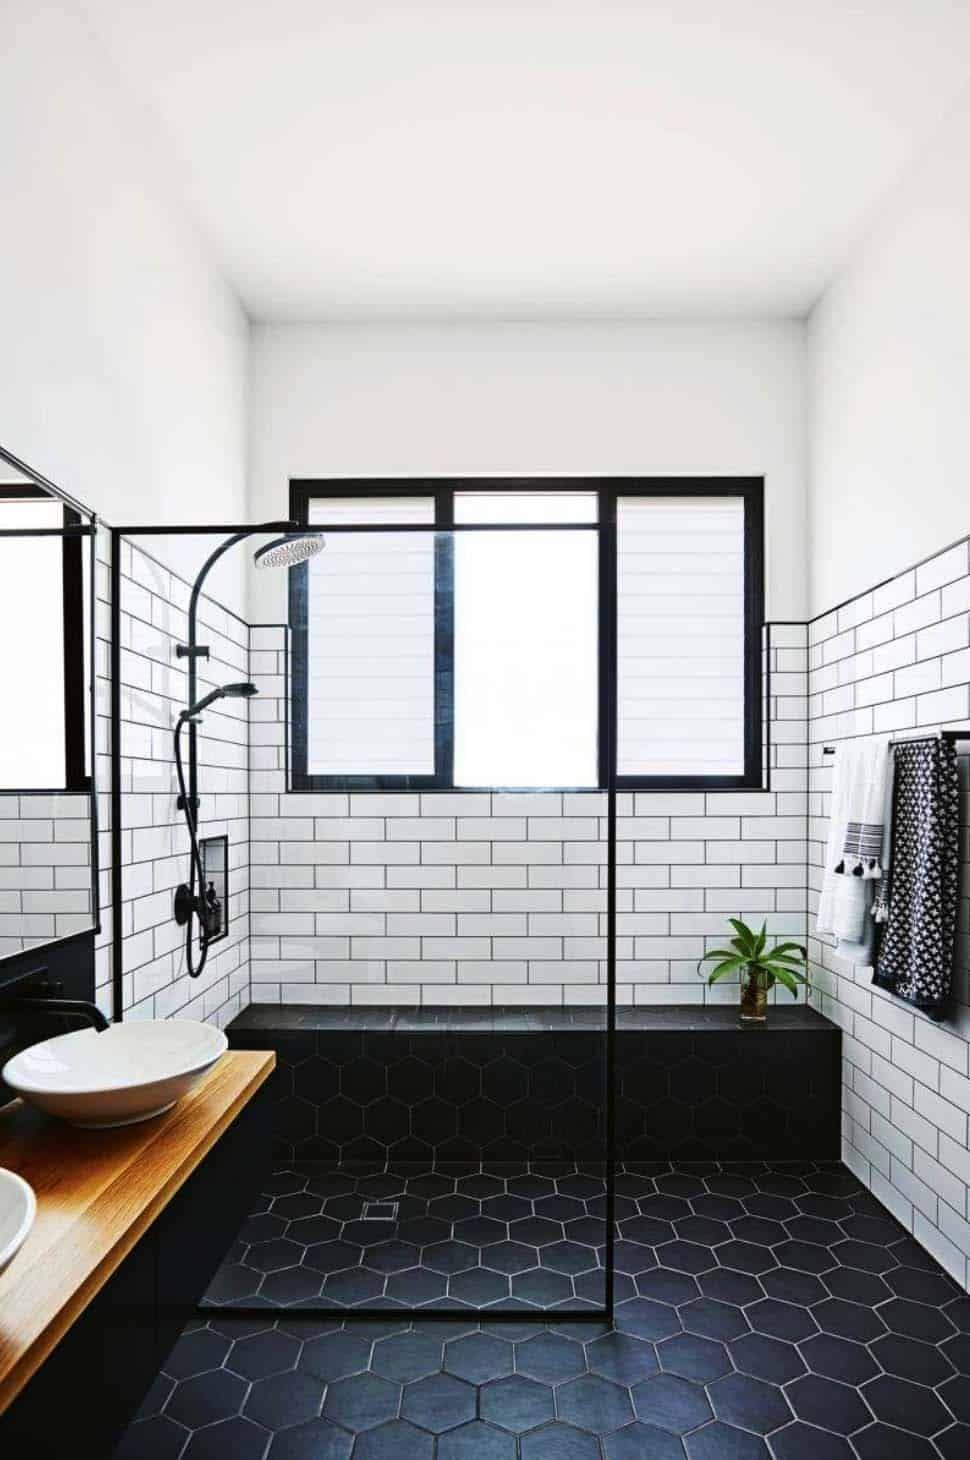 25 Incredibly Stylish Black And White Bathroom Ideas To Inspire Black Bathroom Small Bathroom Makeover Bathroom Interior Design